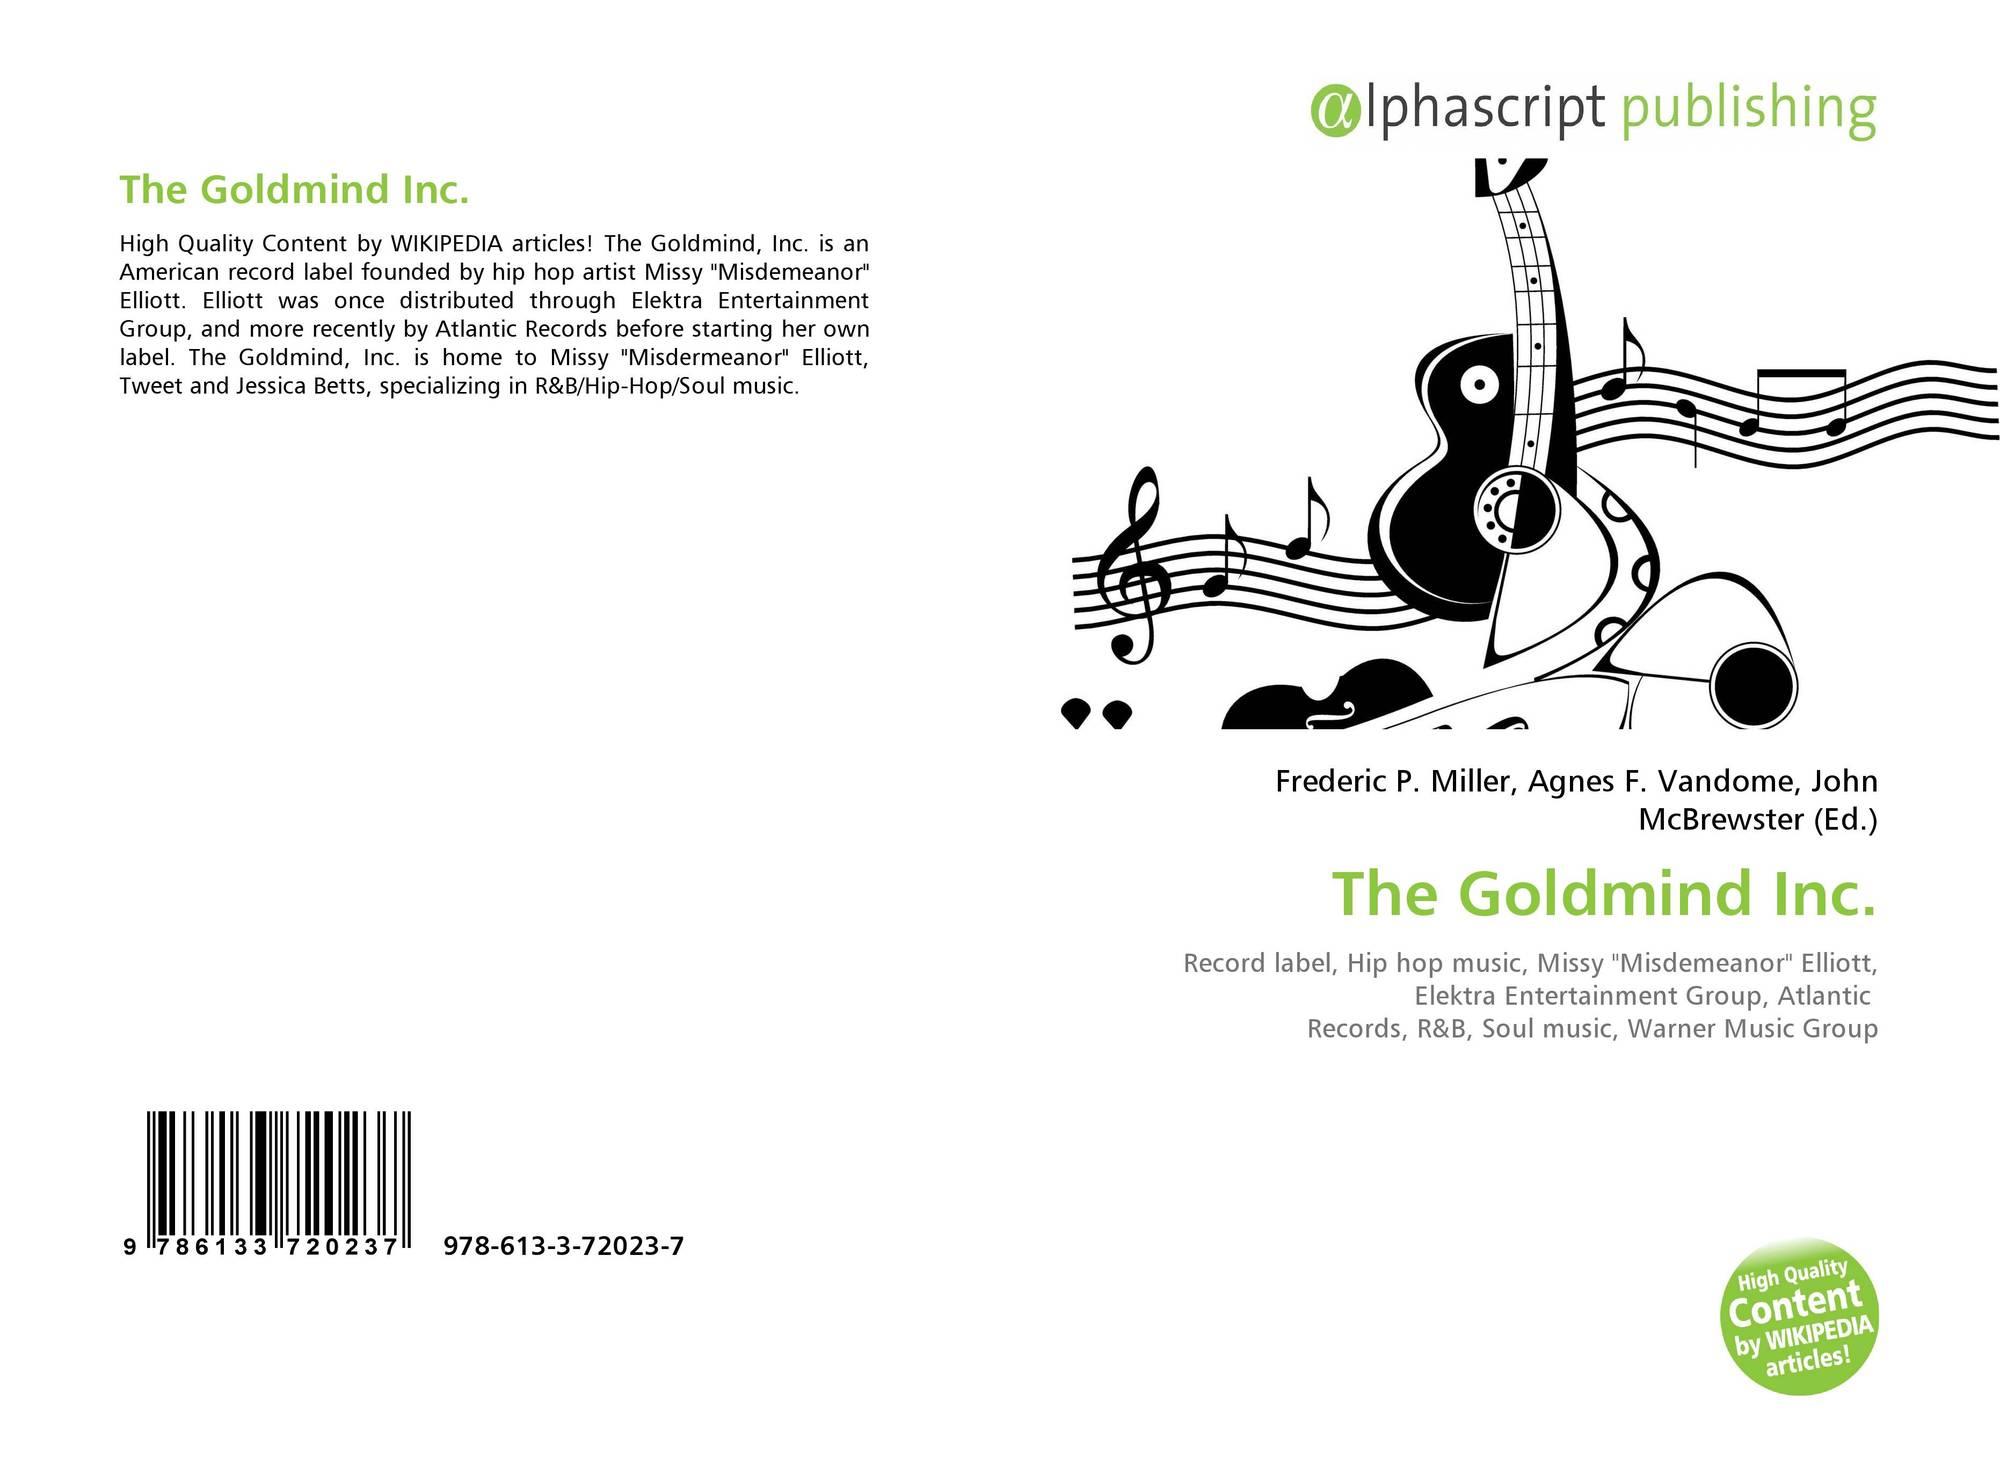 The Goldmind Inc , 978-613-3-72023-7, 6133720239 ,9786133720237